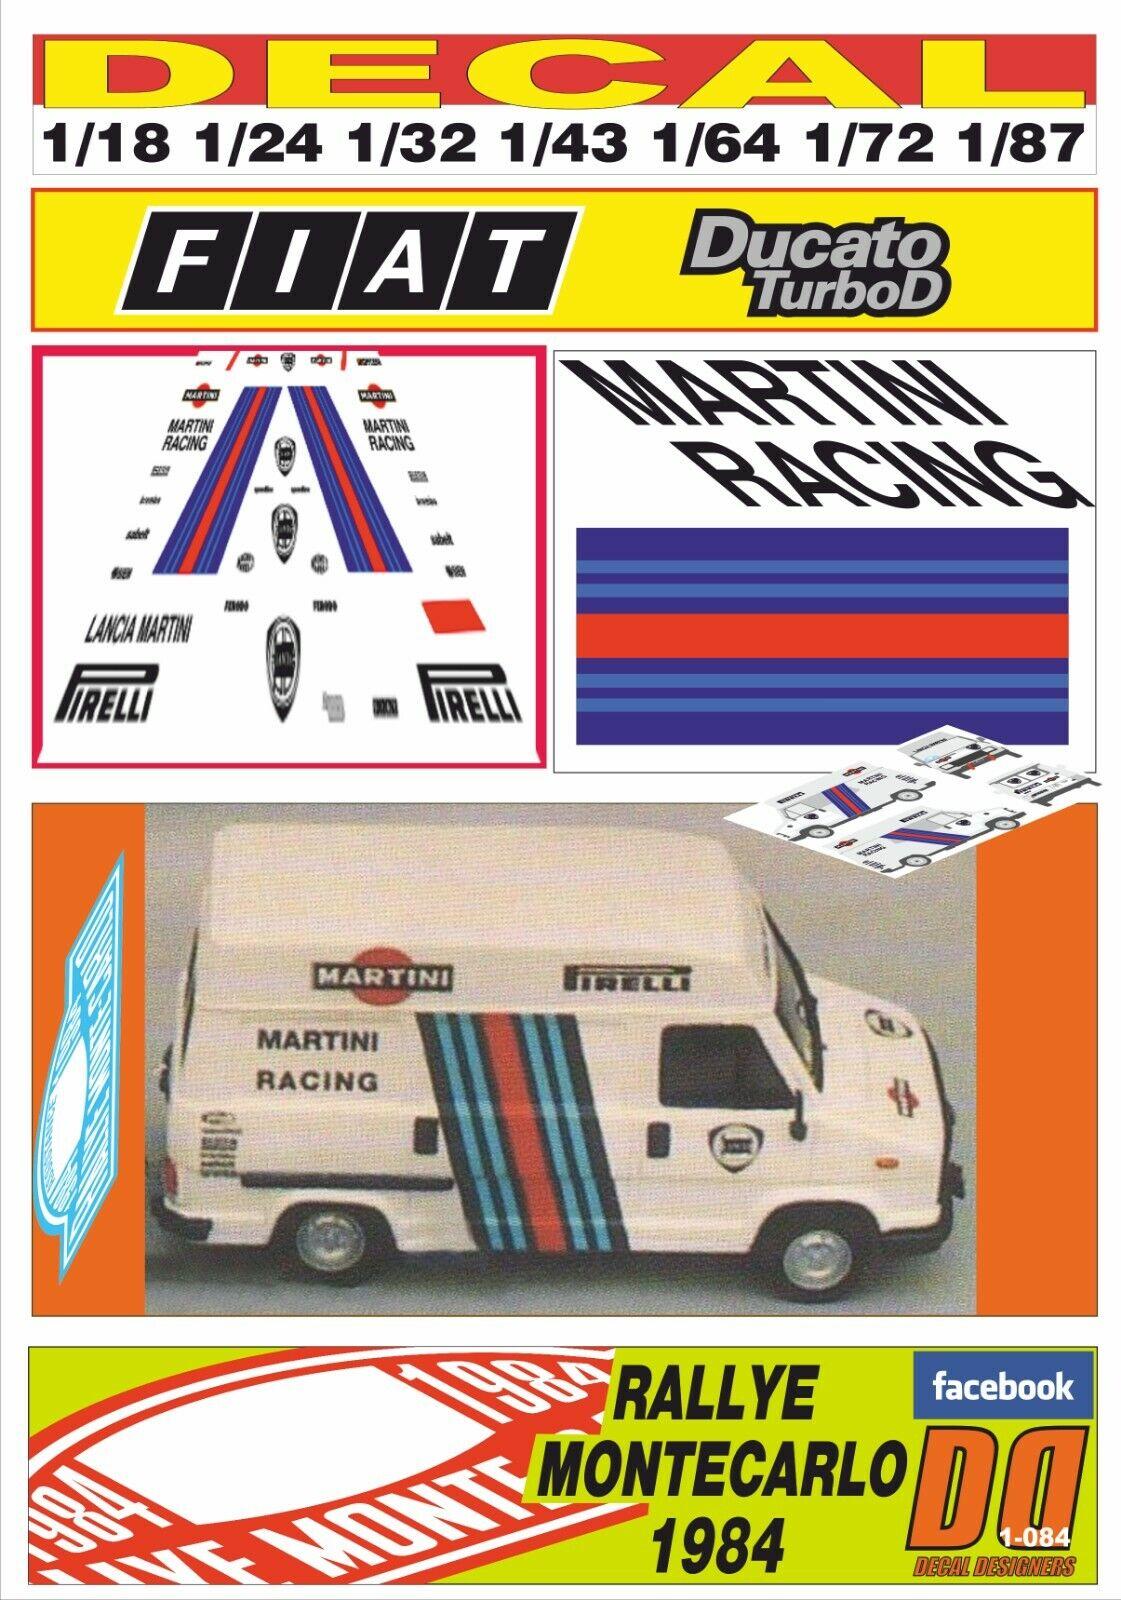 DECAL FIAT DUCAT LANCIA MkonstINI RAKTING R.MONTEbilLO 1984 (01)